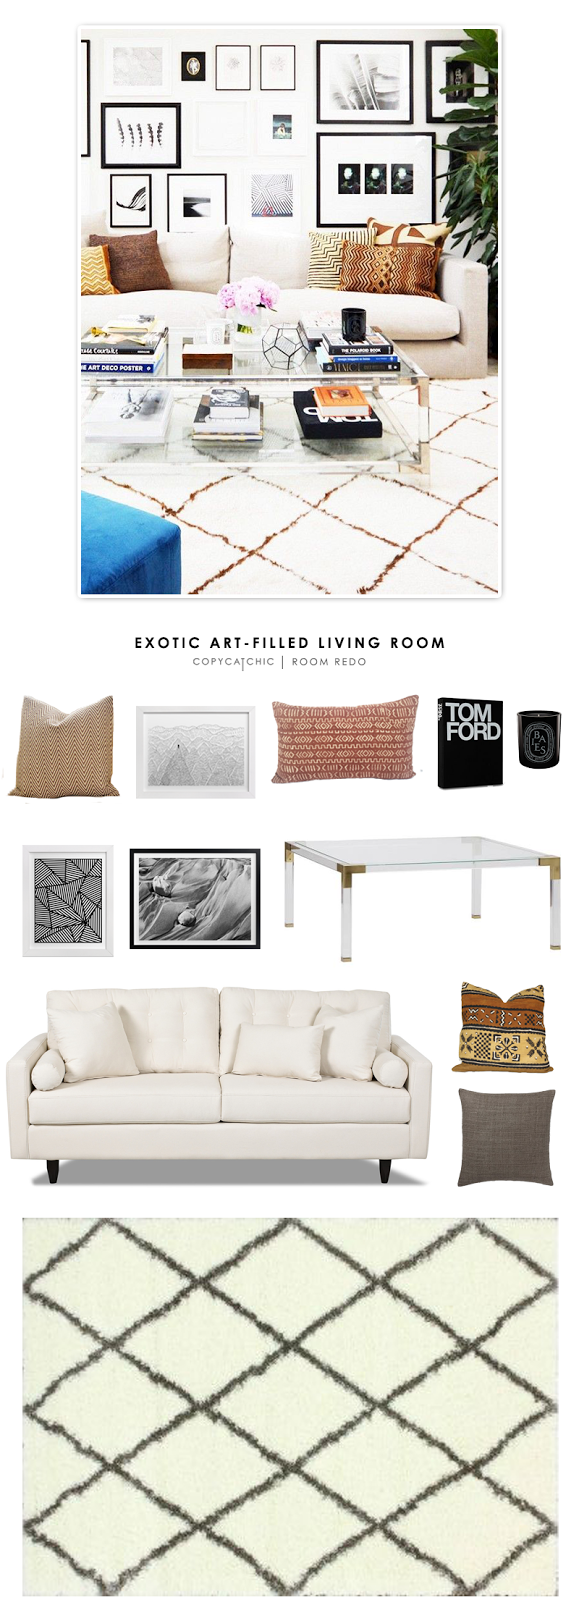 Exotic Living Room Ideas: Exotic Art-Filled Living Room